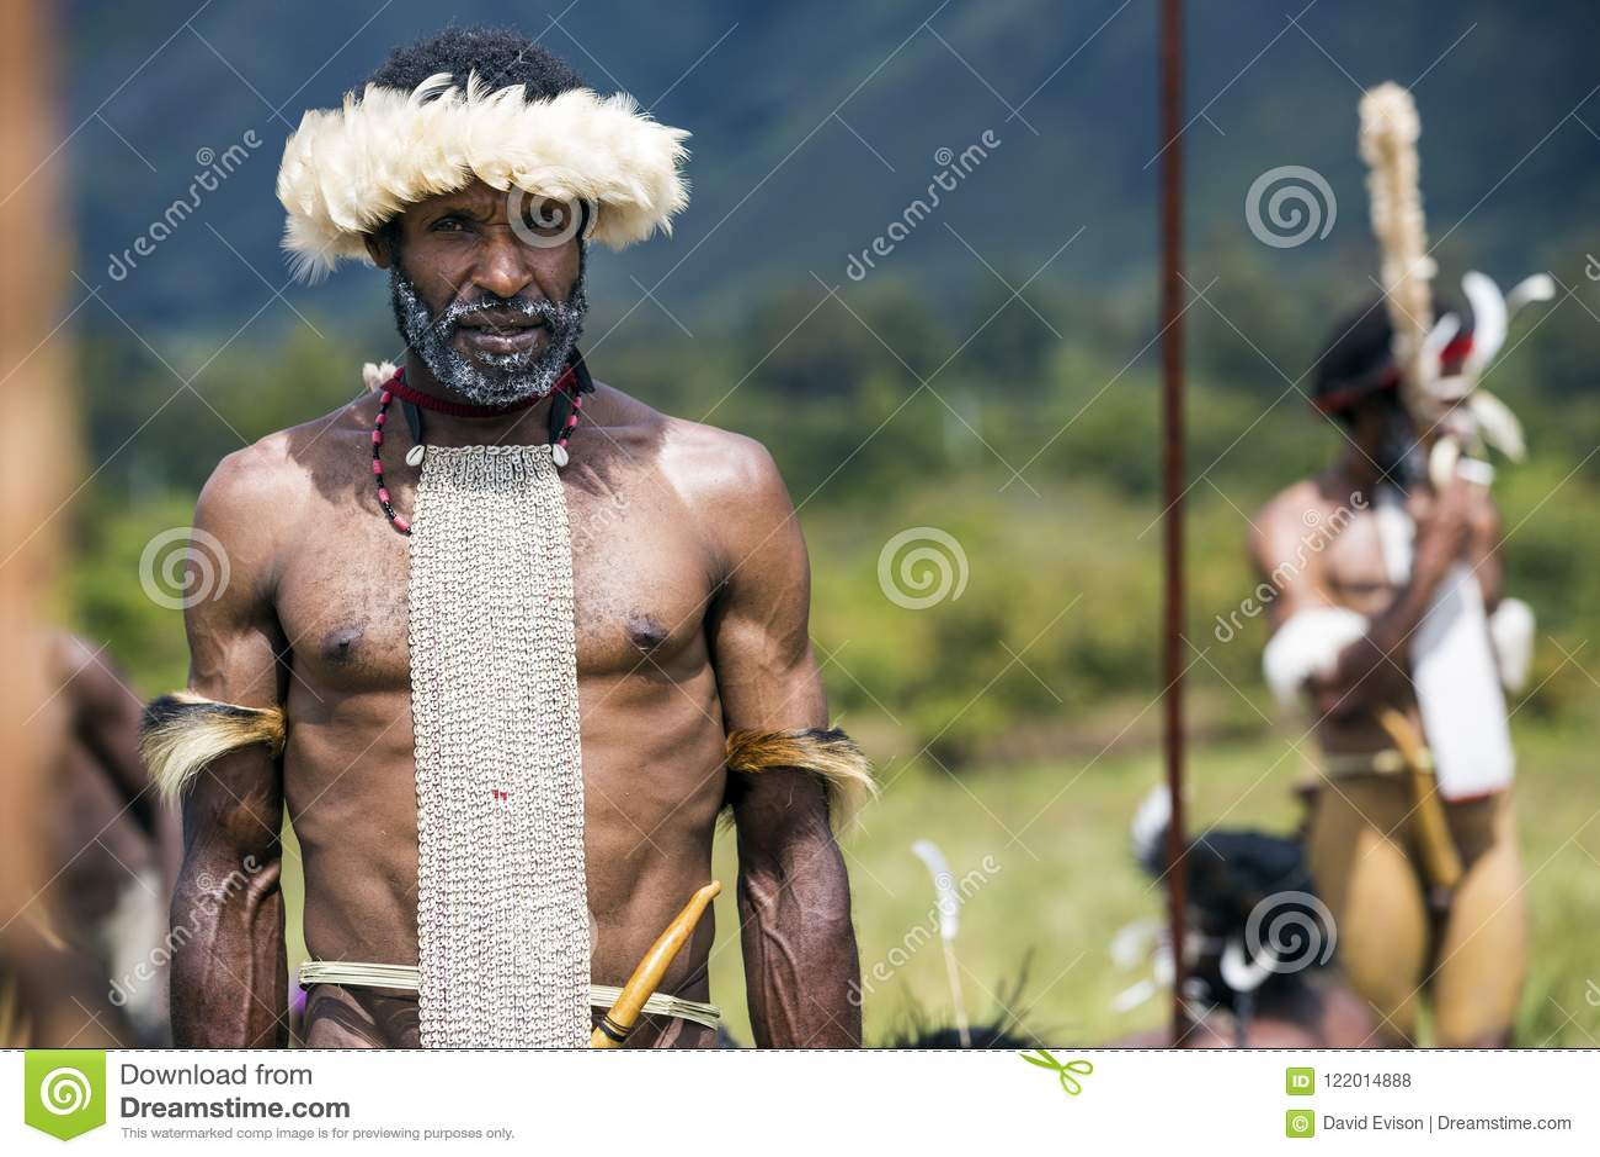 Dani tribesmen at the annual Baliem Valley Festival.